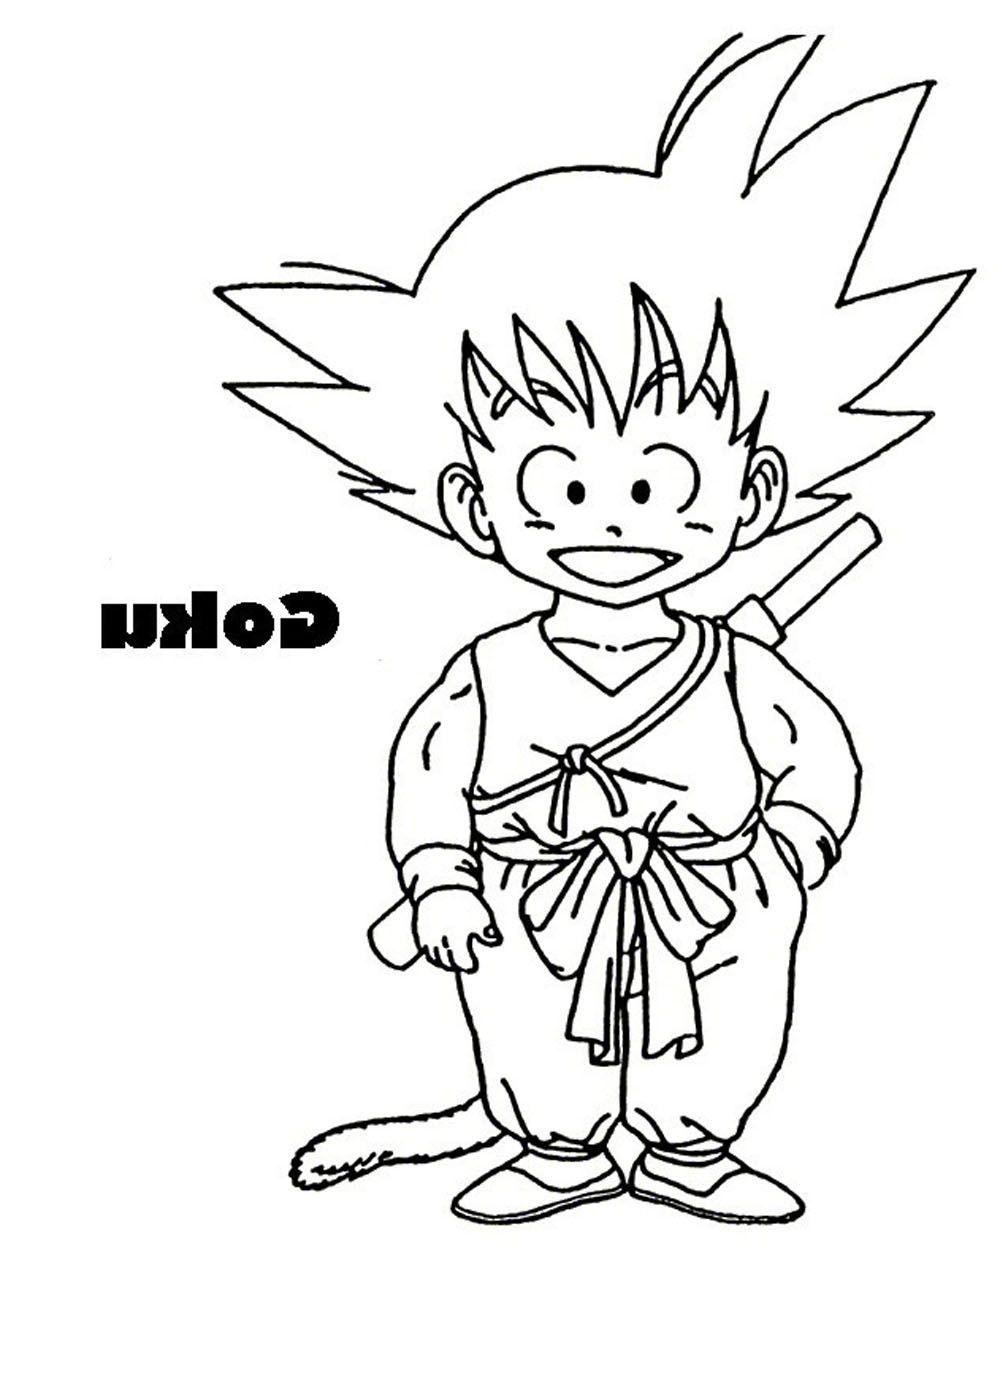 Imagen de Goku niño para imprimir reco | dragón bol | Pinterest ...